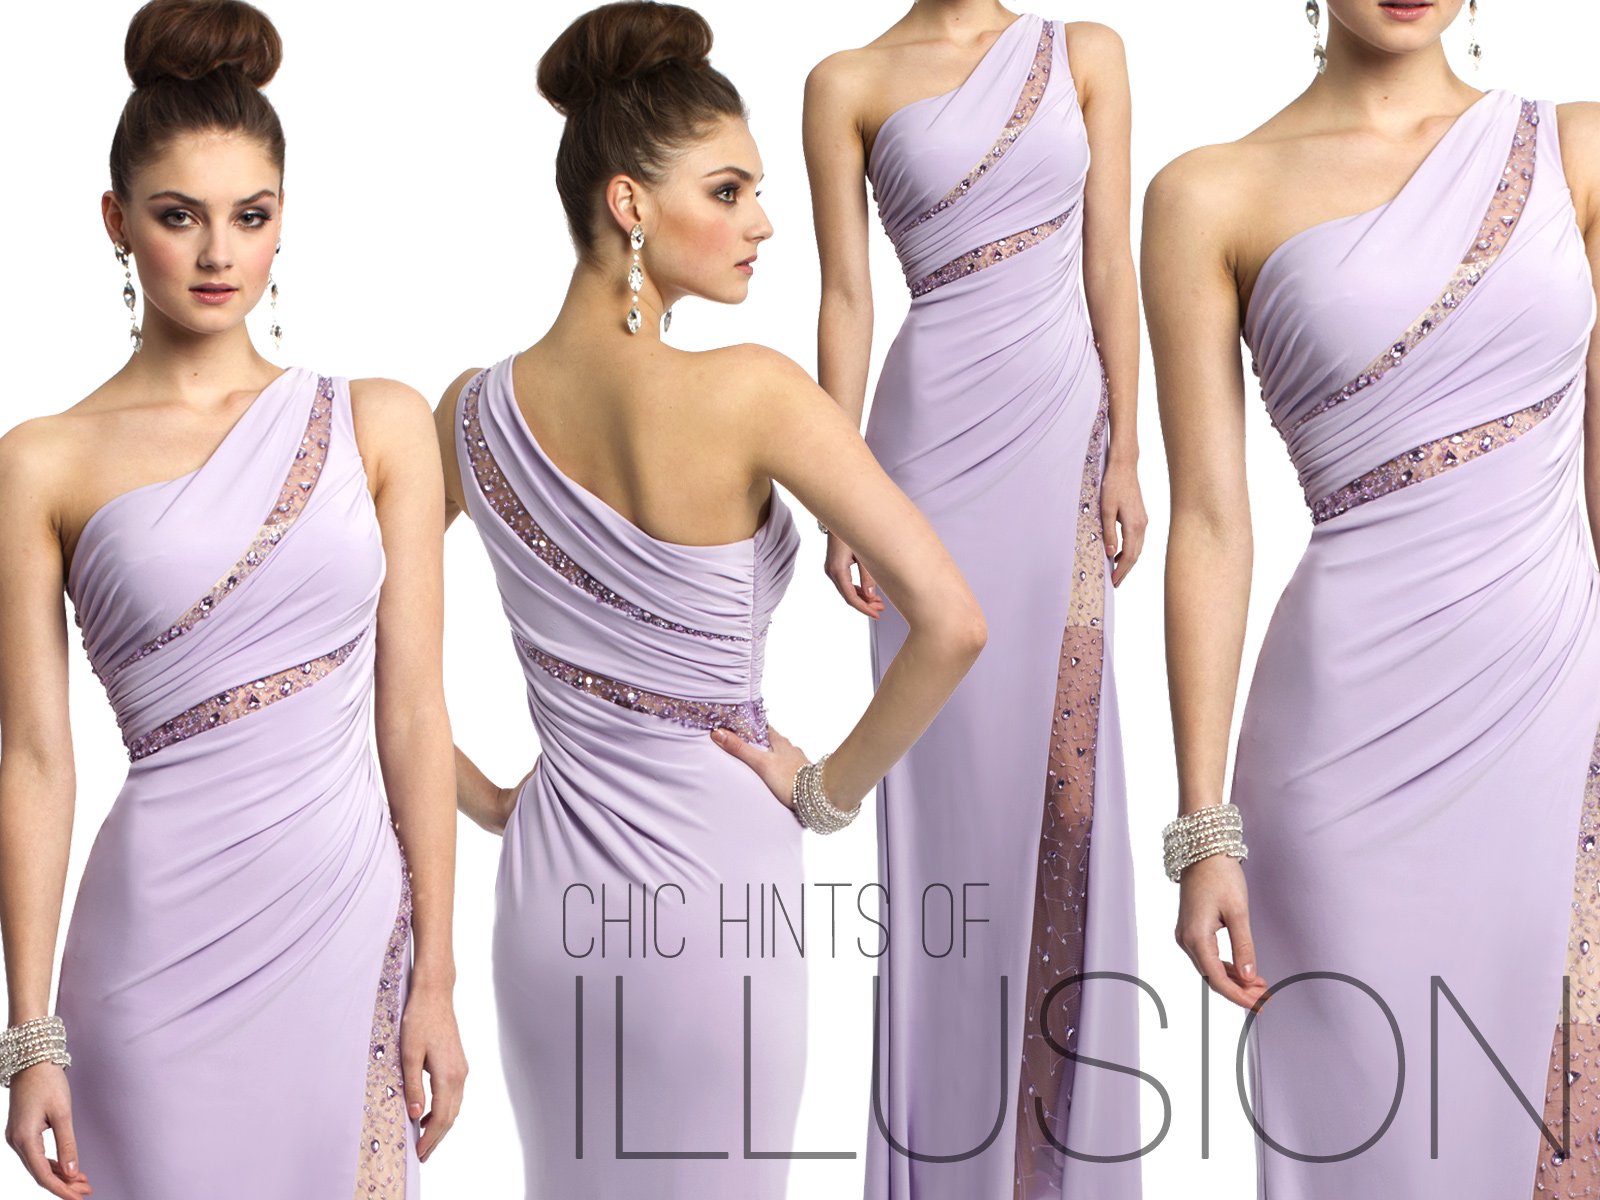 Guest Of Wedding 2014 Top Trend Report: Camille La Vie